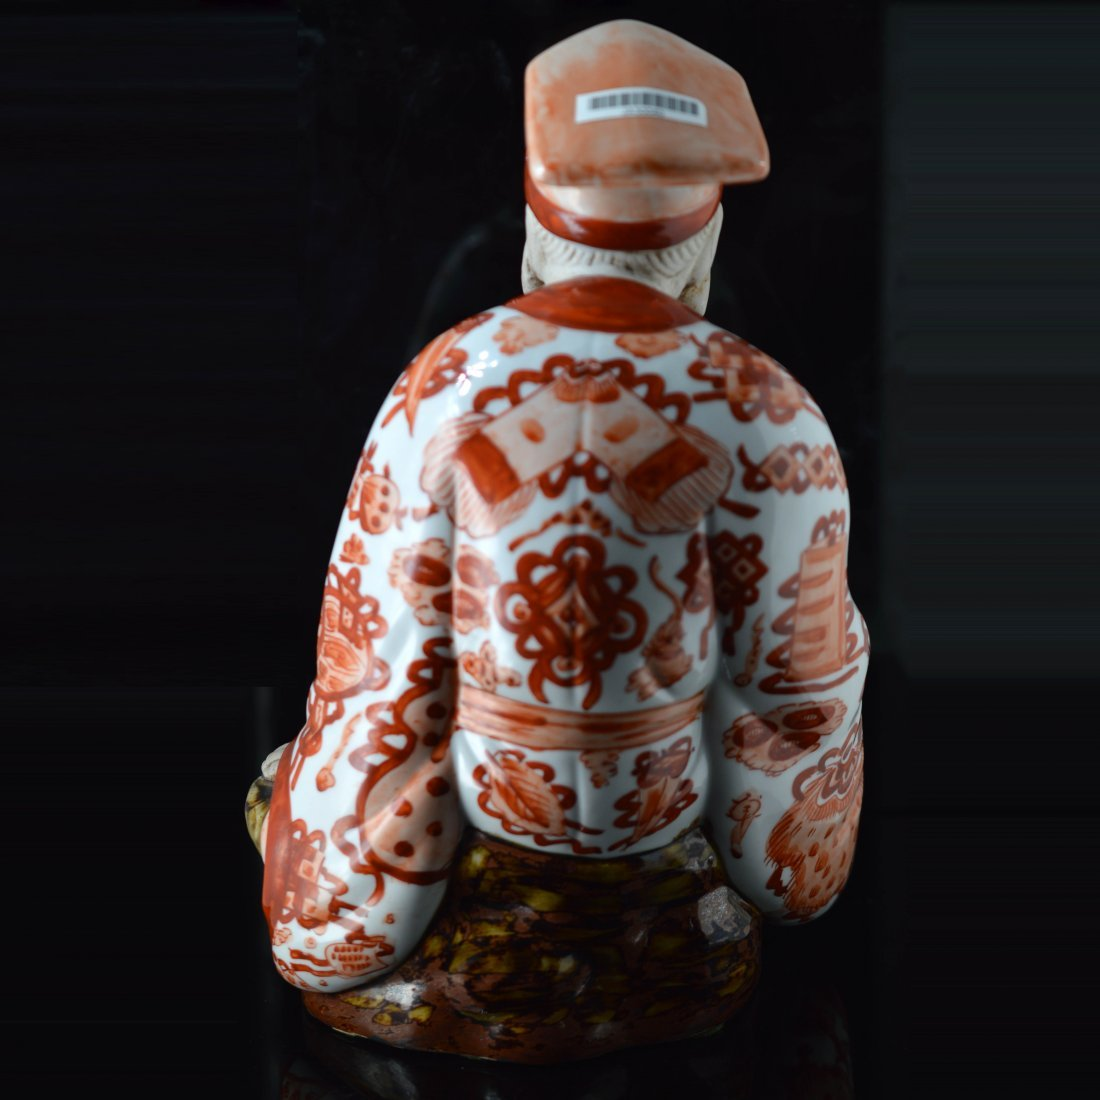 Red Glazed Japanese Porcelain Figure Ornament - 3